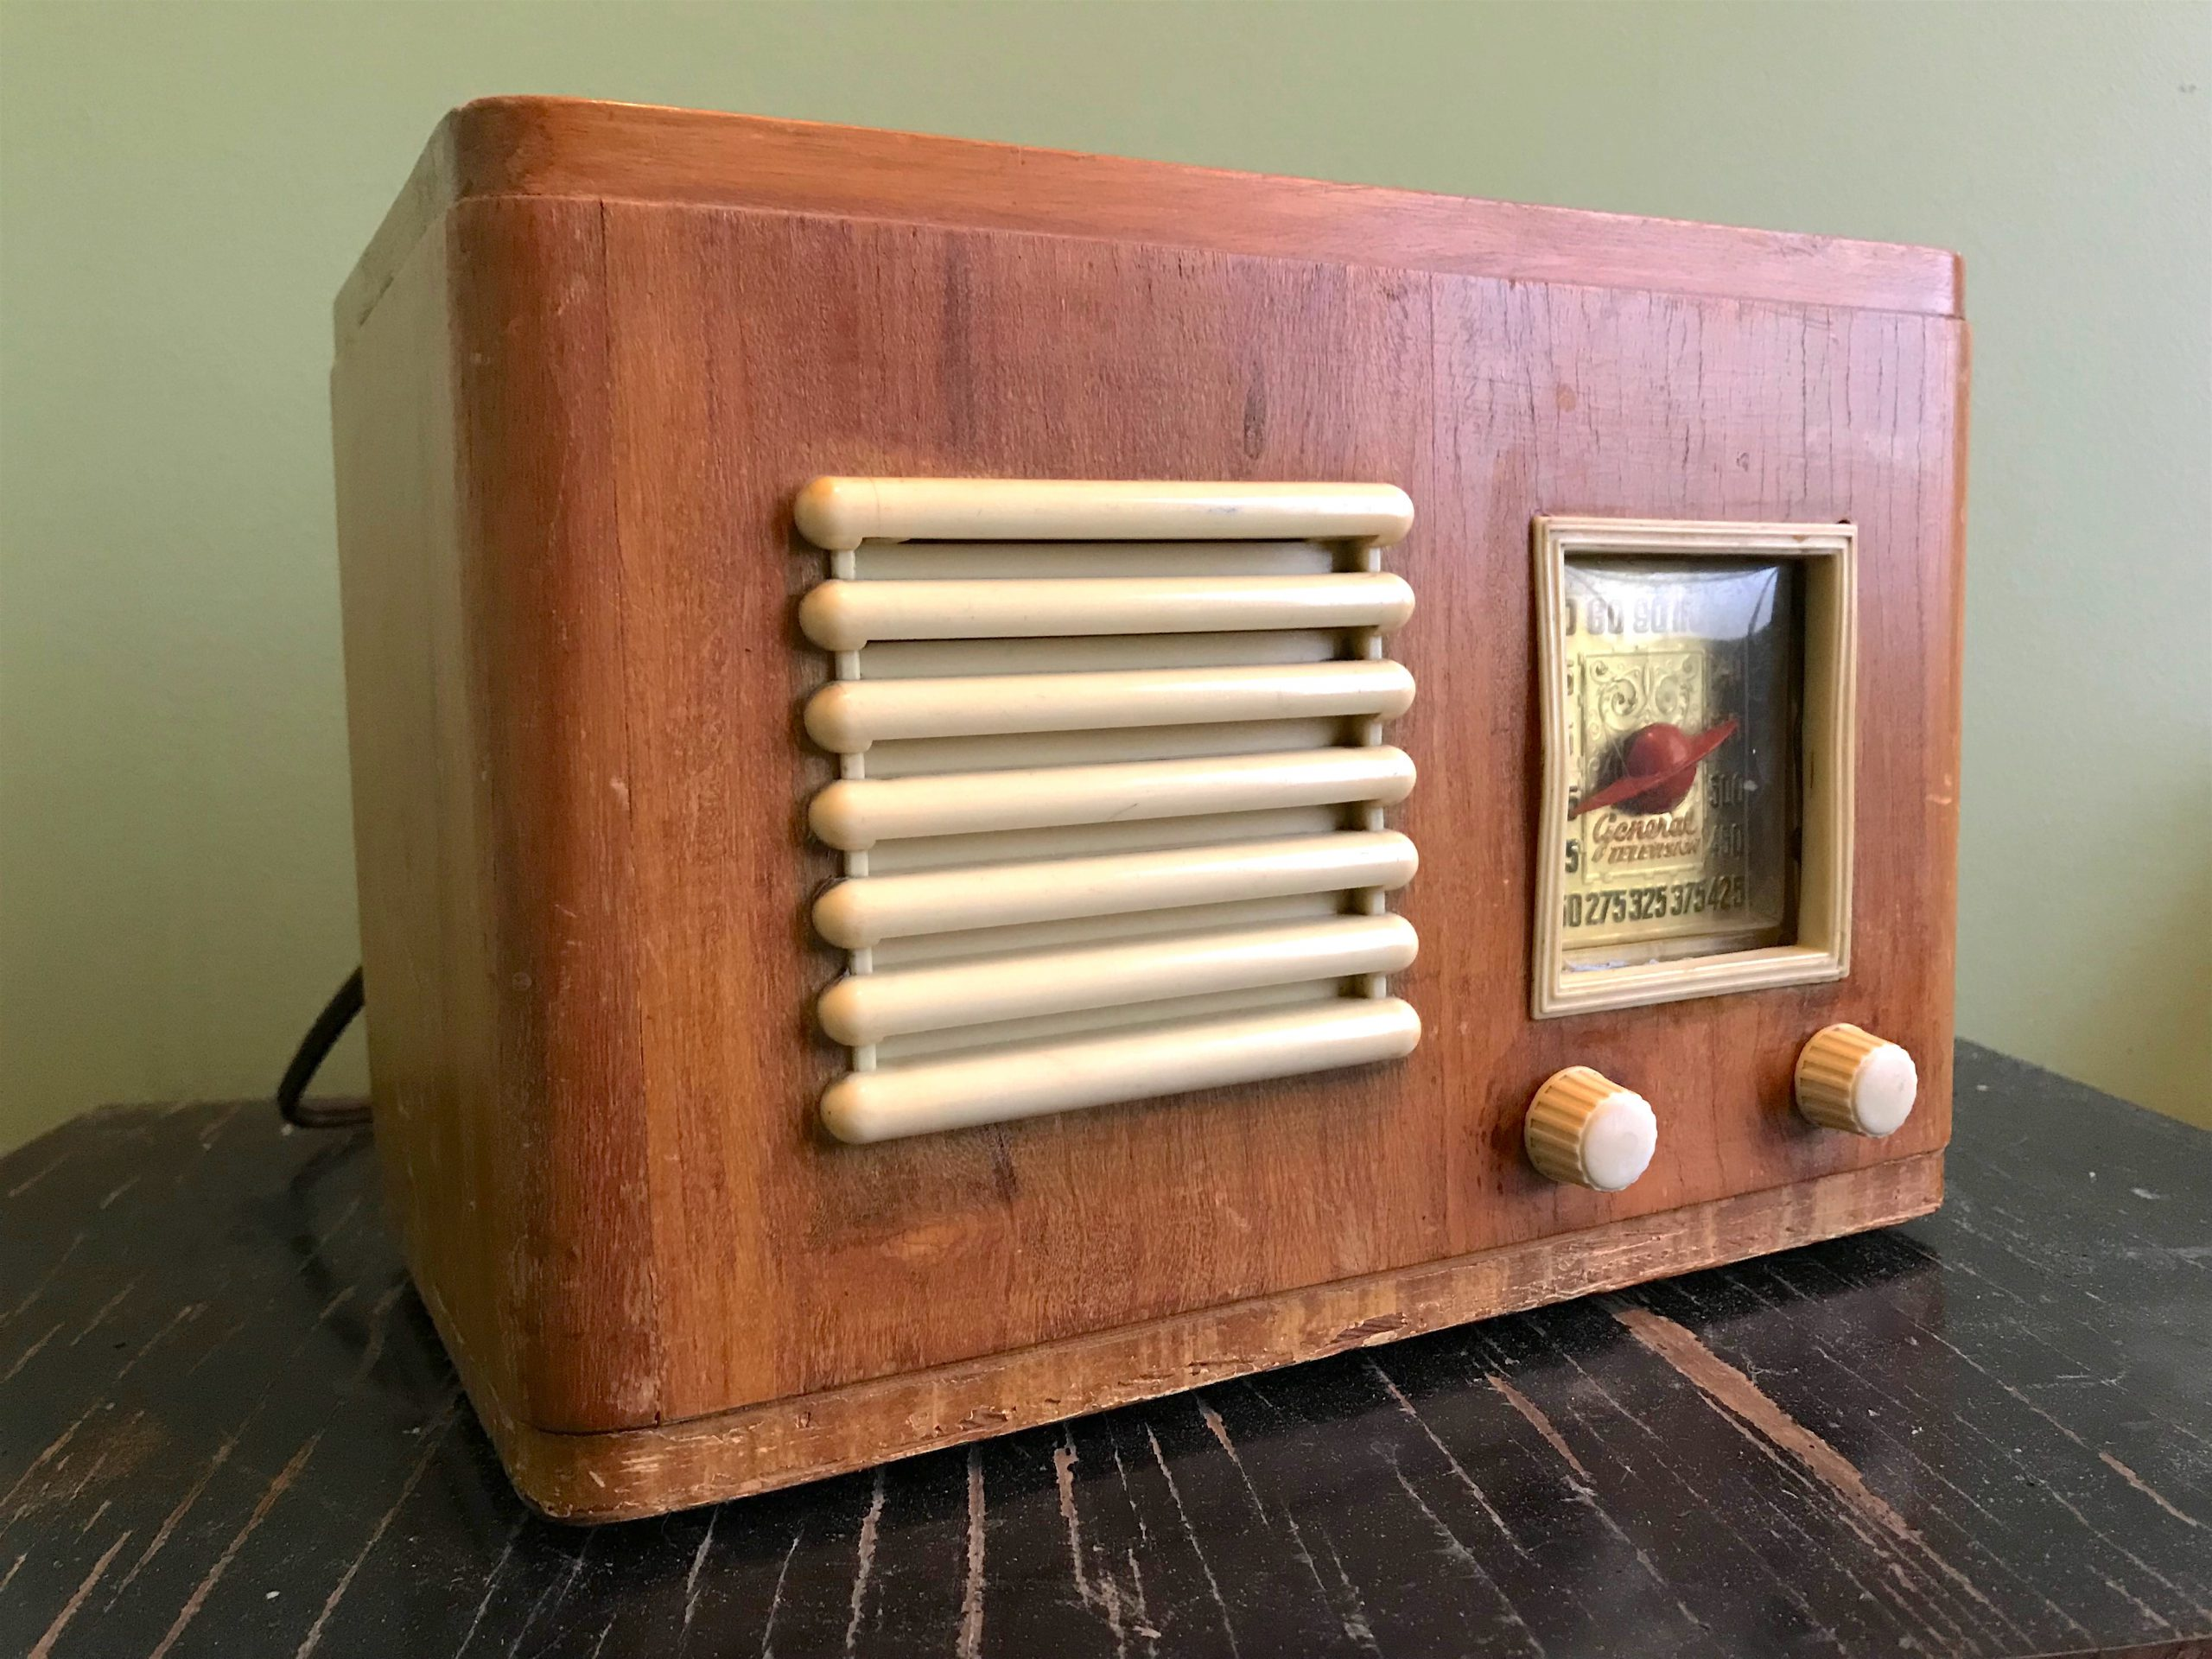 General Television & Radio Corp. History